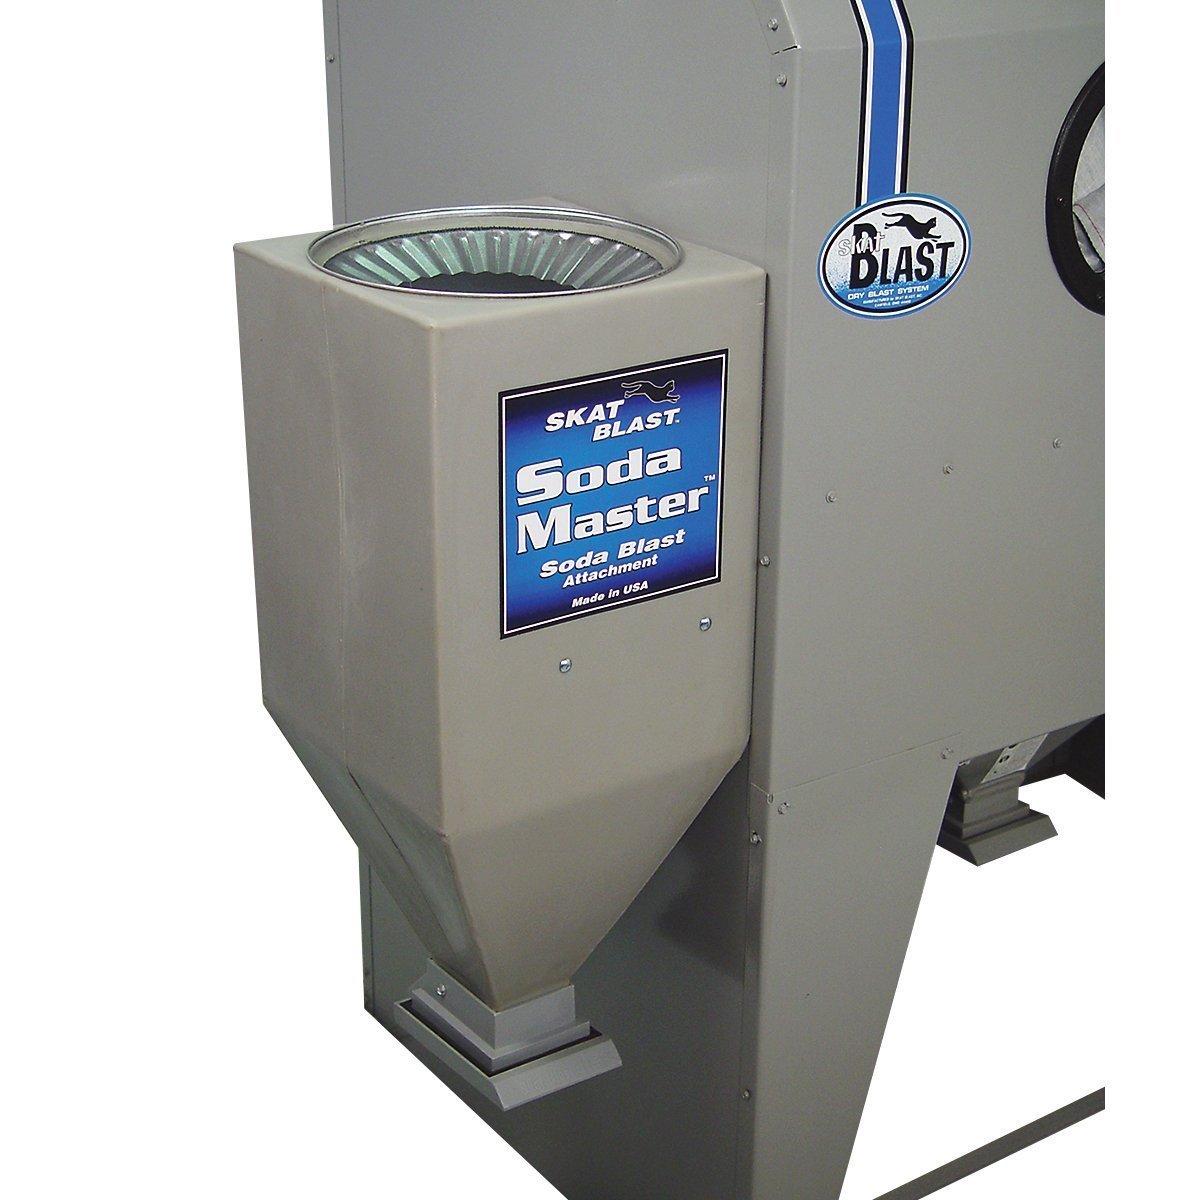 SM-50 Direct Mount Soda Master Attachment for Abrasive Sandblasting Cabinet